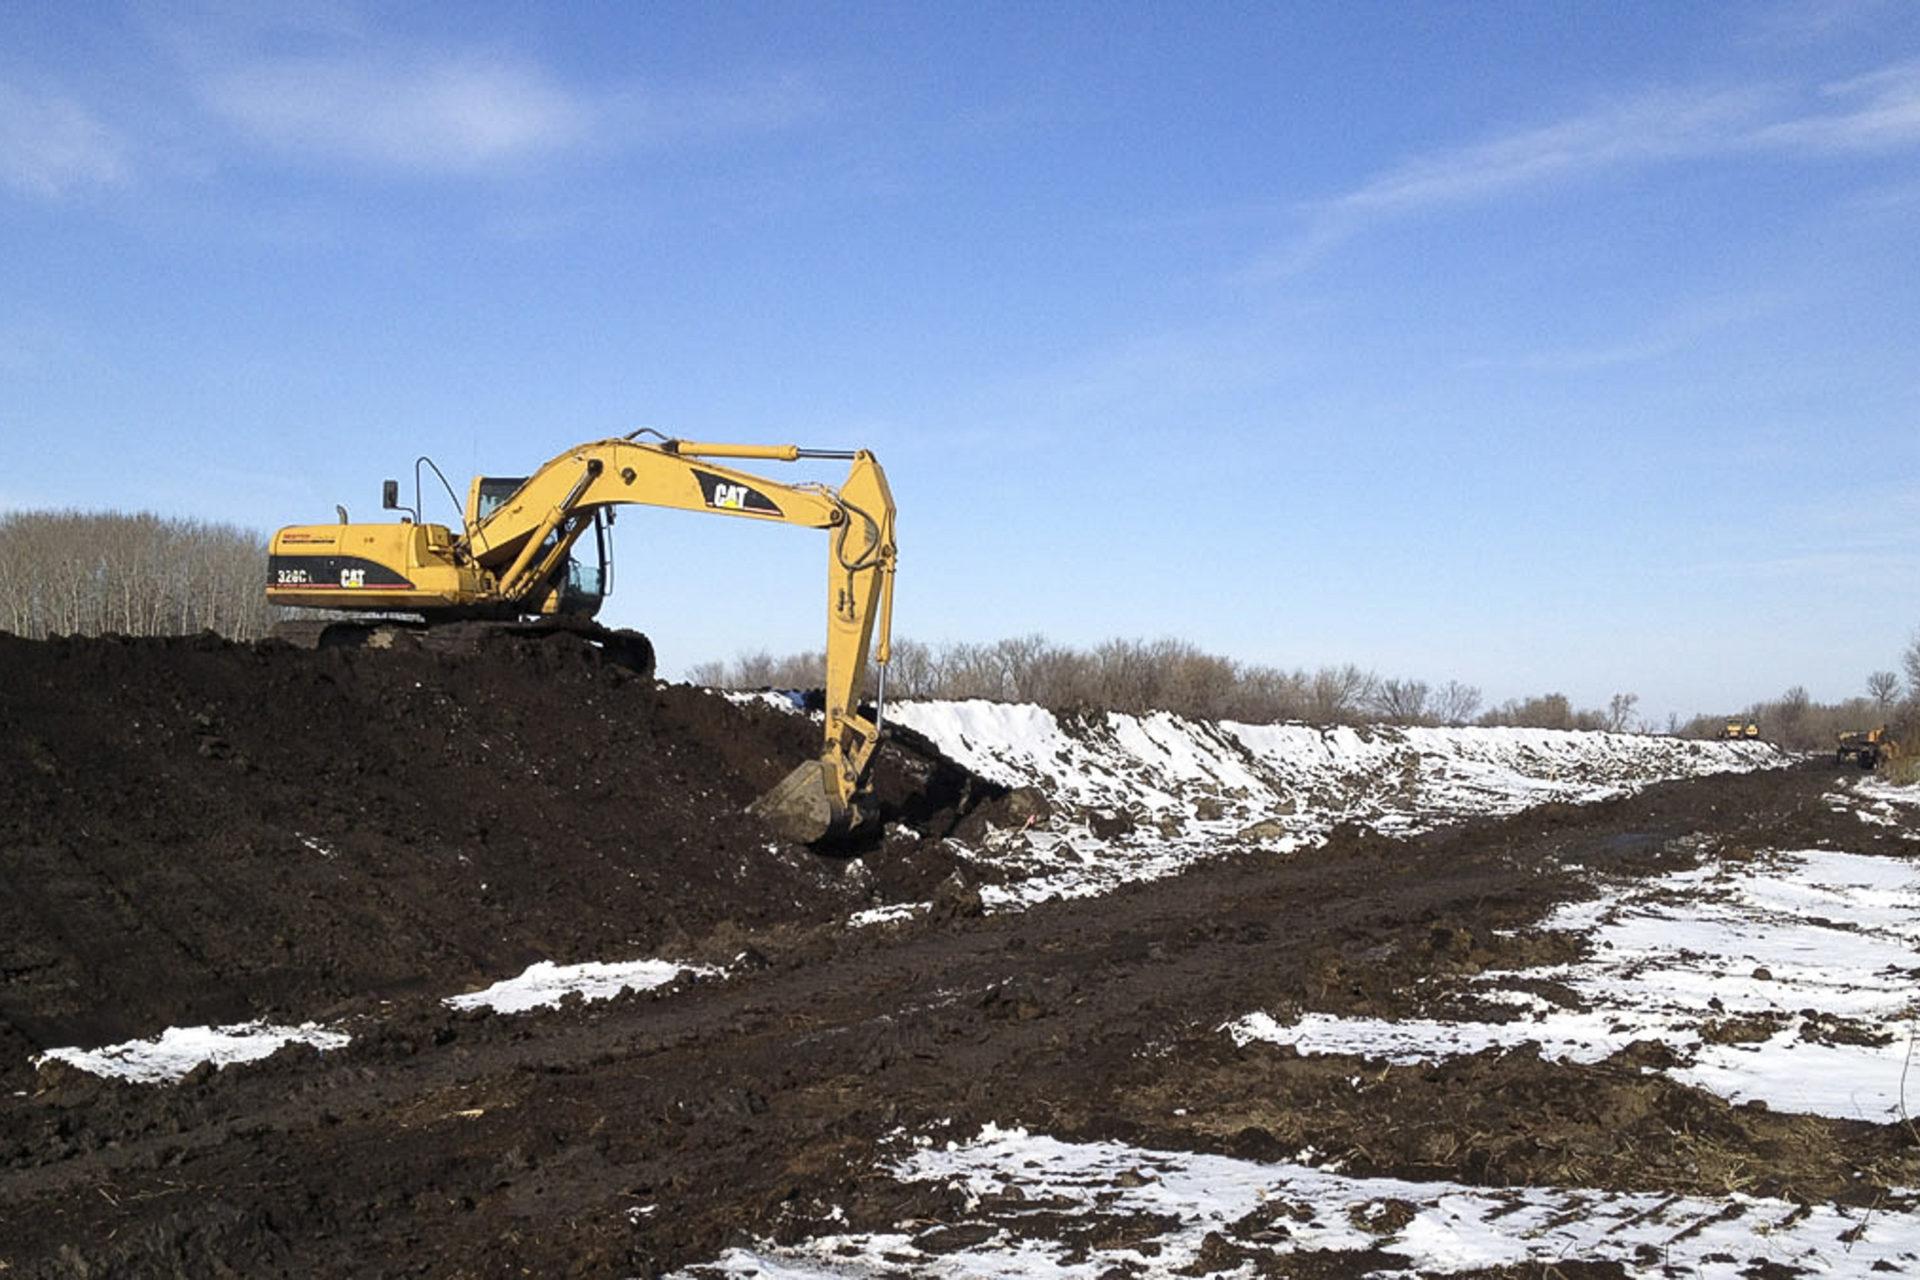 Chanupawakpa Dakota First Nation Dike Build